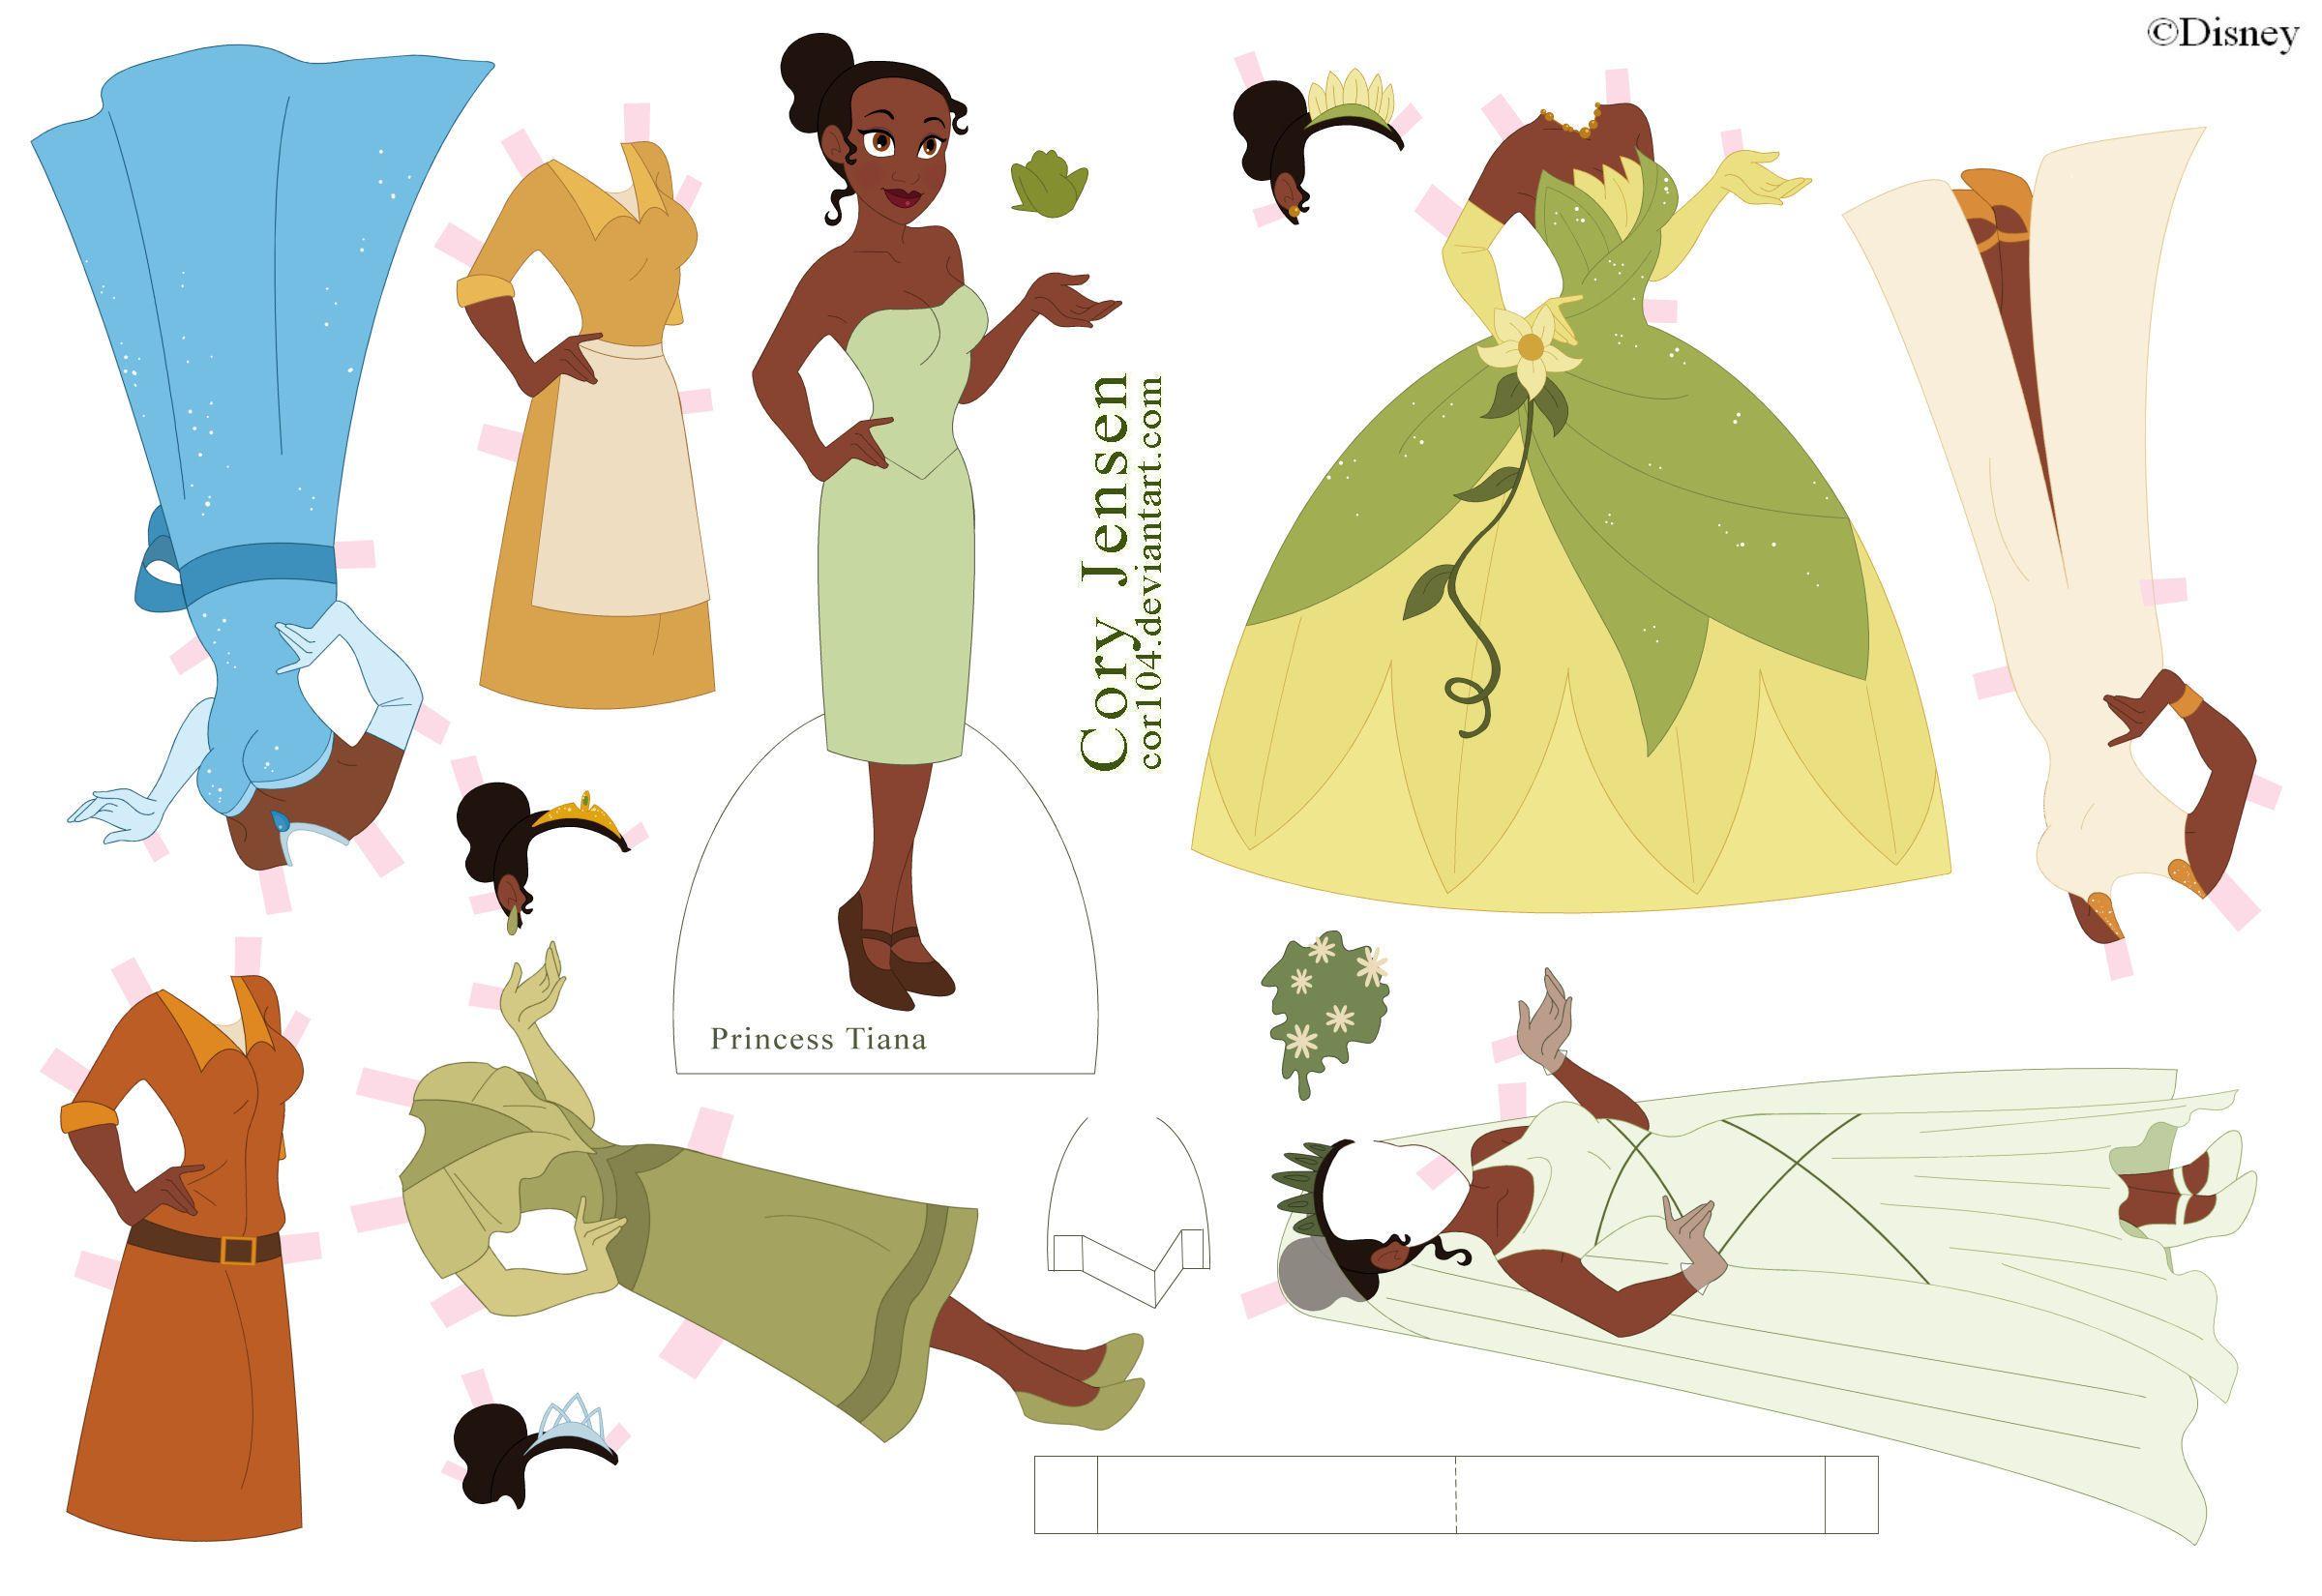 Princess for disney - Sapos y princesas valencia ...